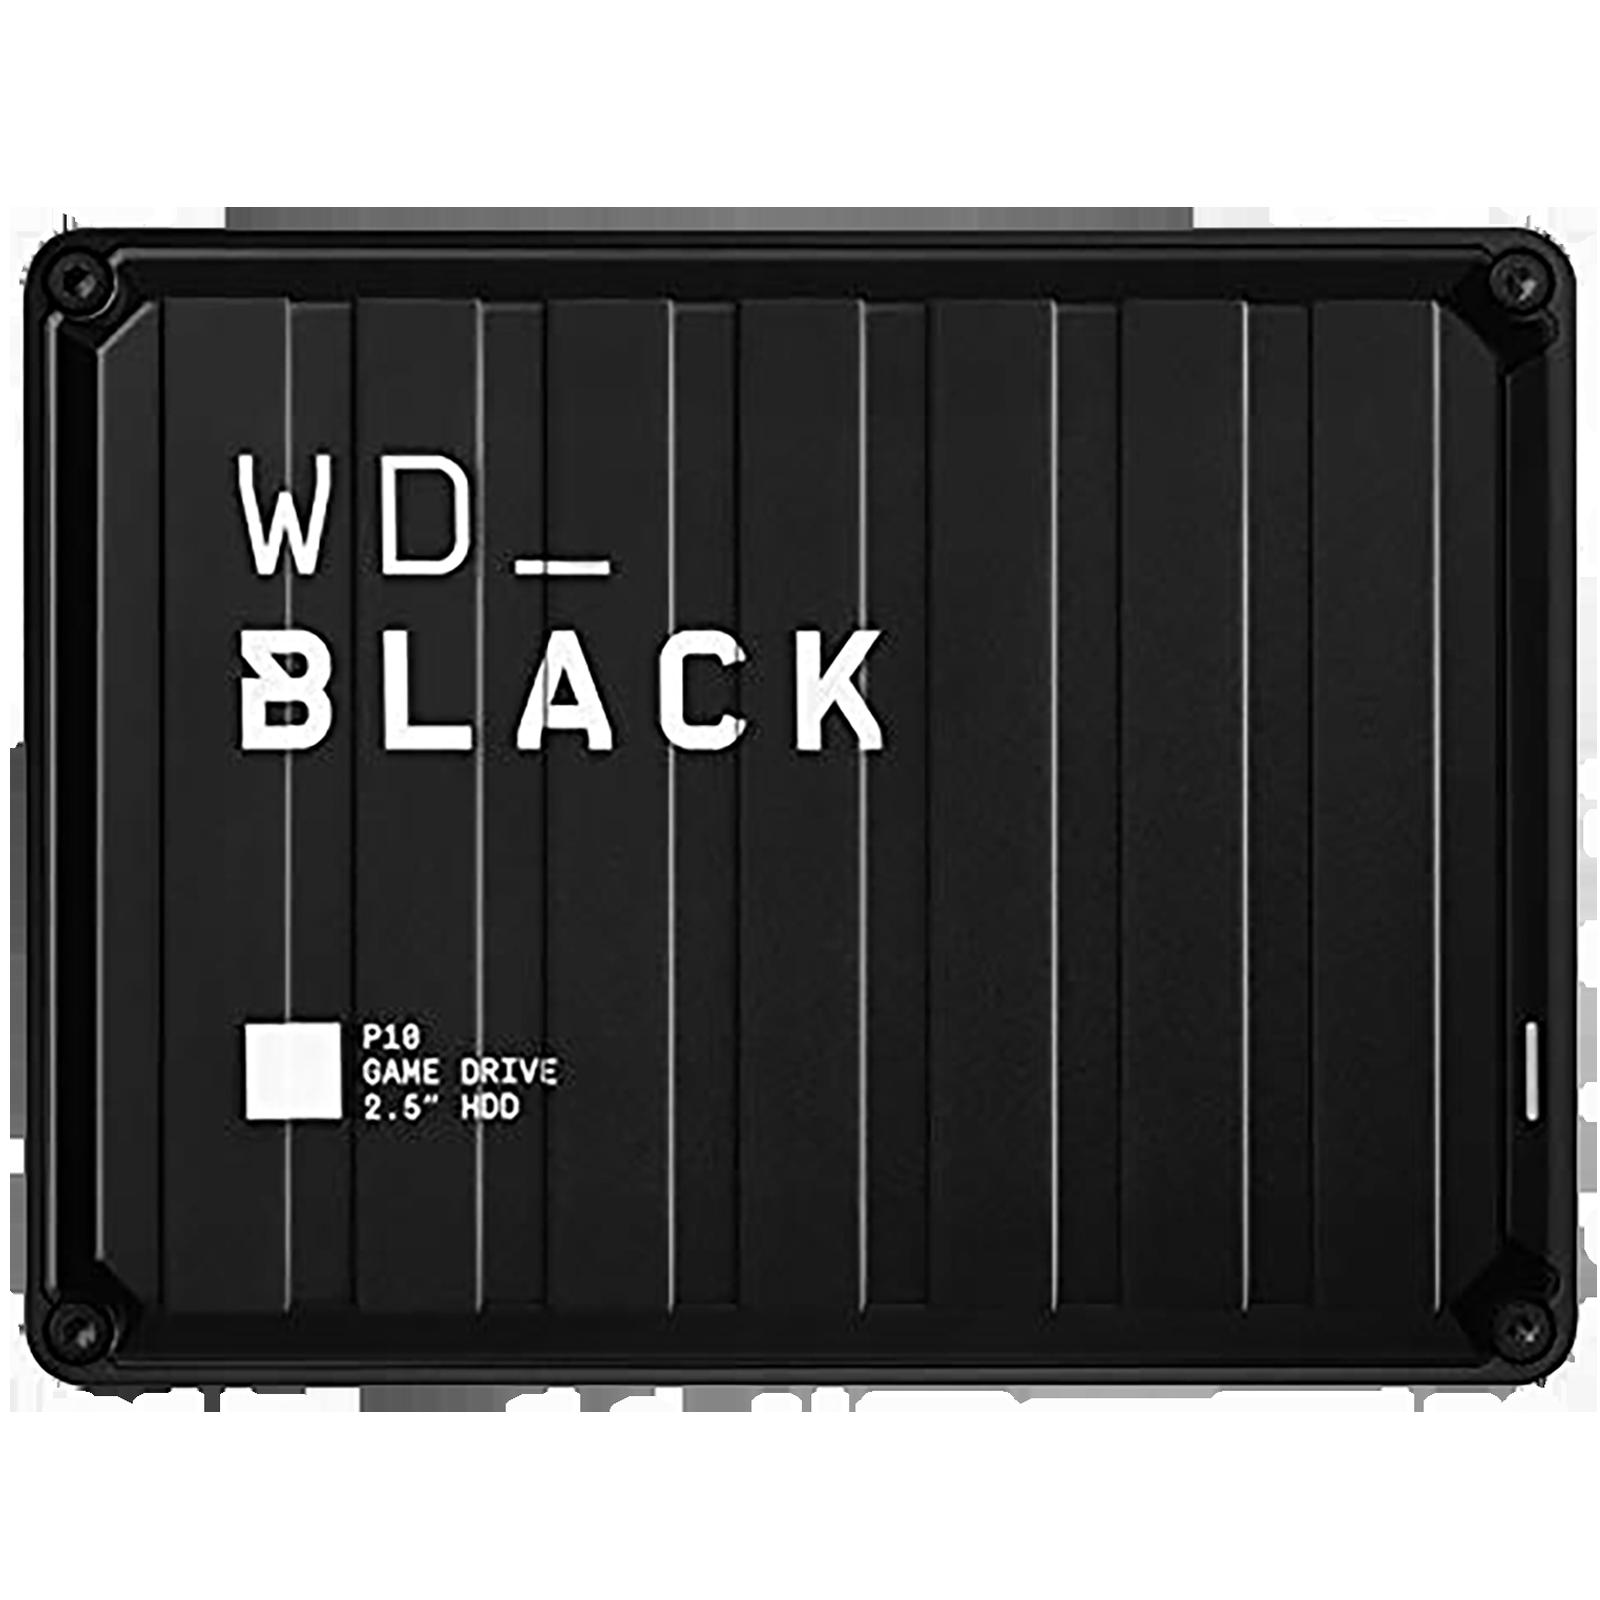 Western Digital WD_BLACK P10 5 TB USB 1.1 Game Drive (Purpose-Built For Gamers, WDBA3A0050BBK-WESN, Black)_1